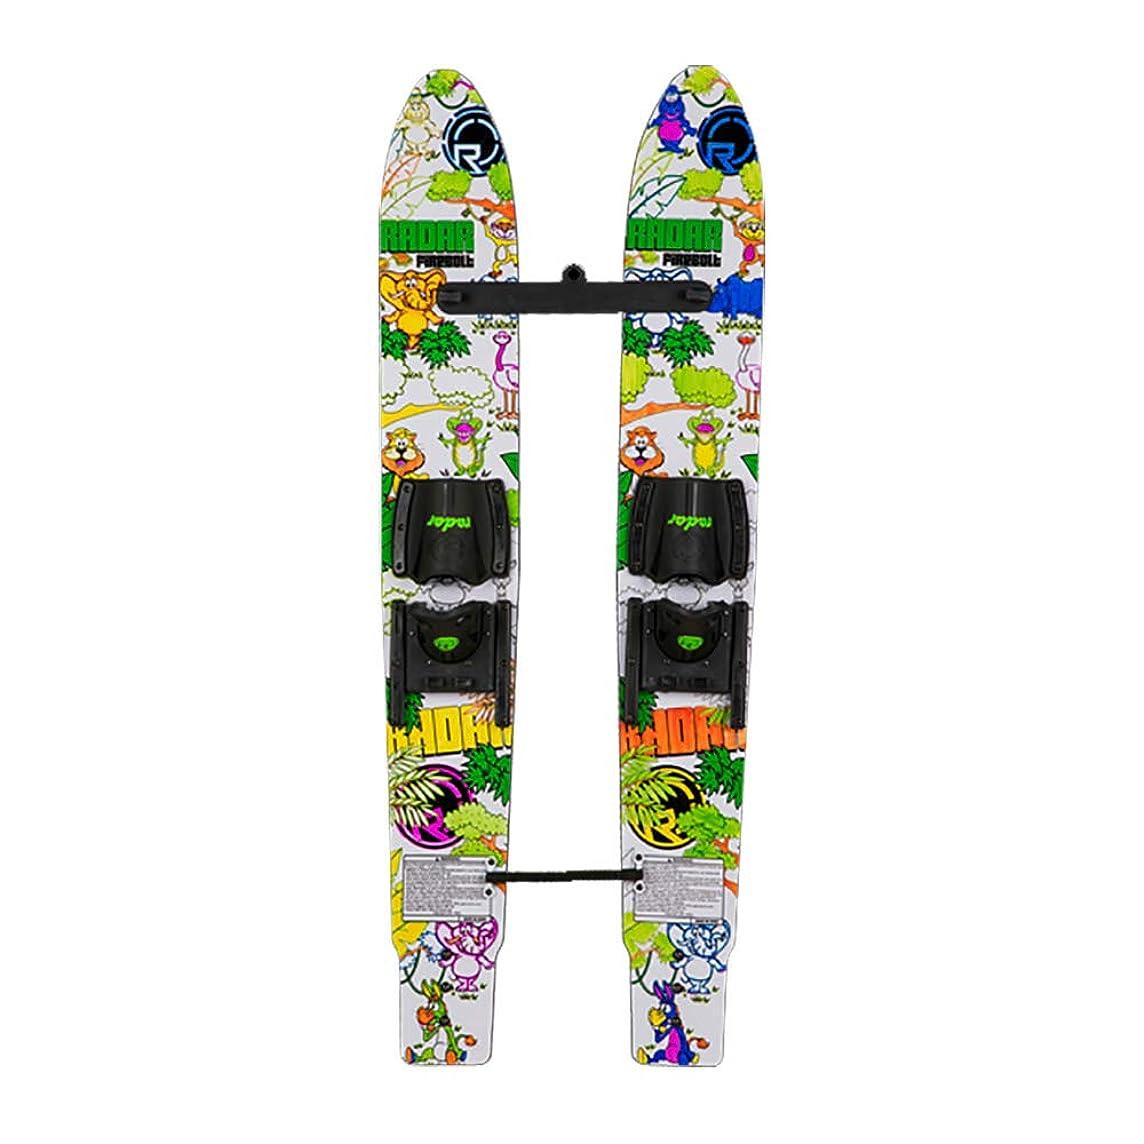 Radar Water Ski Combos 46 - Firebolt w/Child Adj Horseshoe Bindings - Jungle Coloring Book (2019)